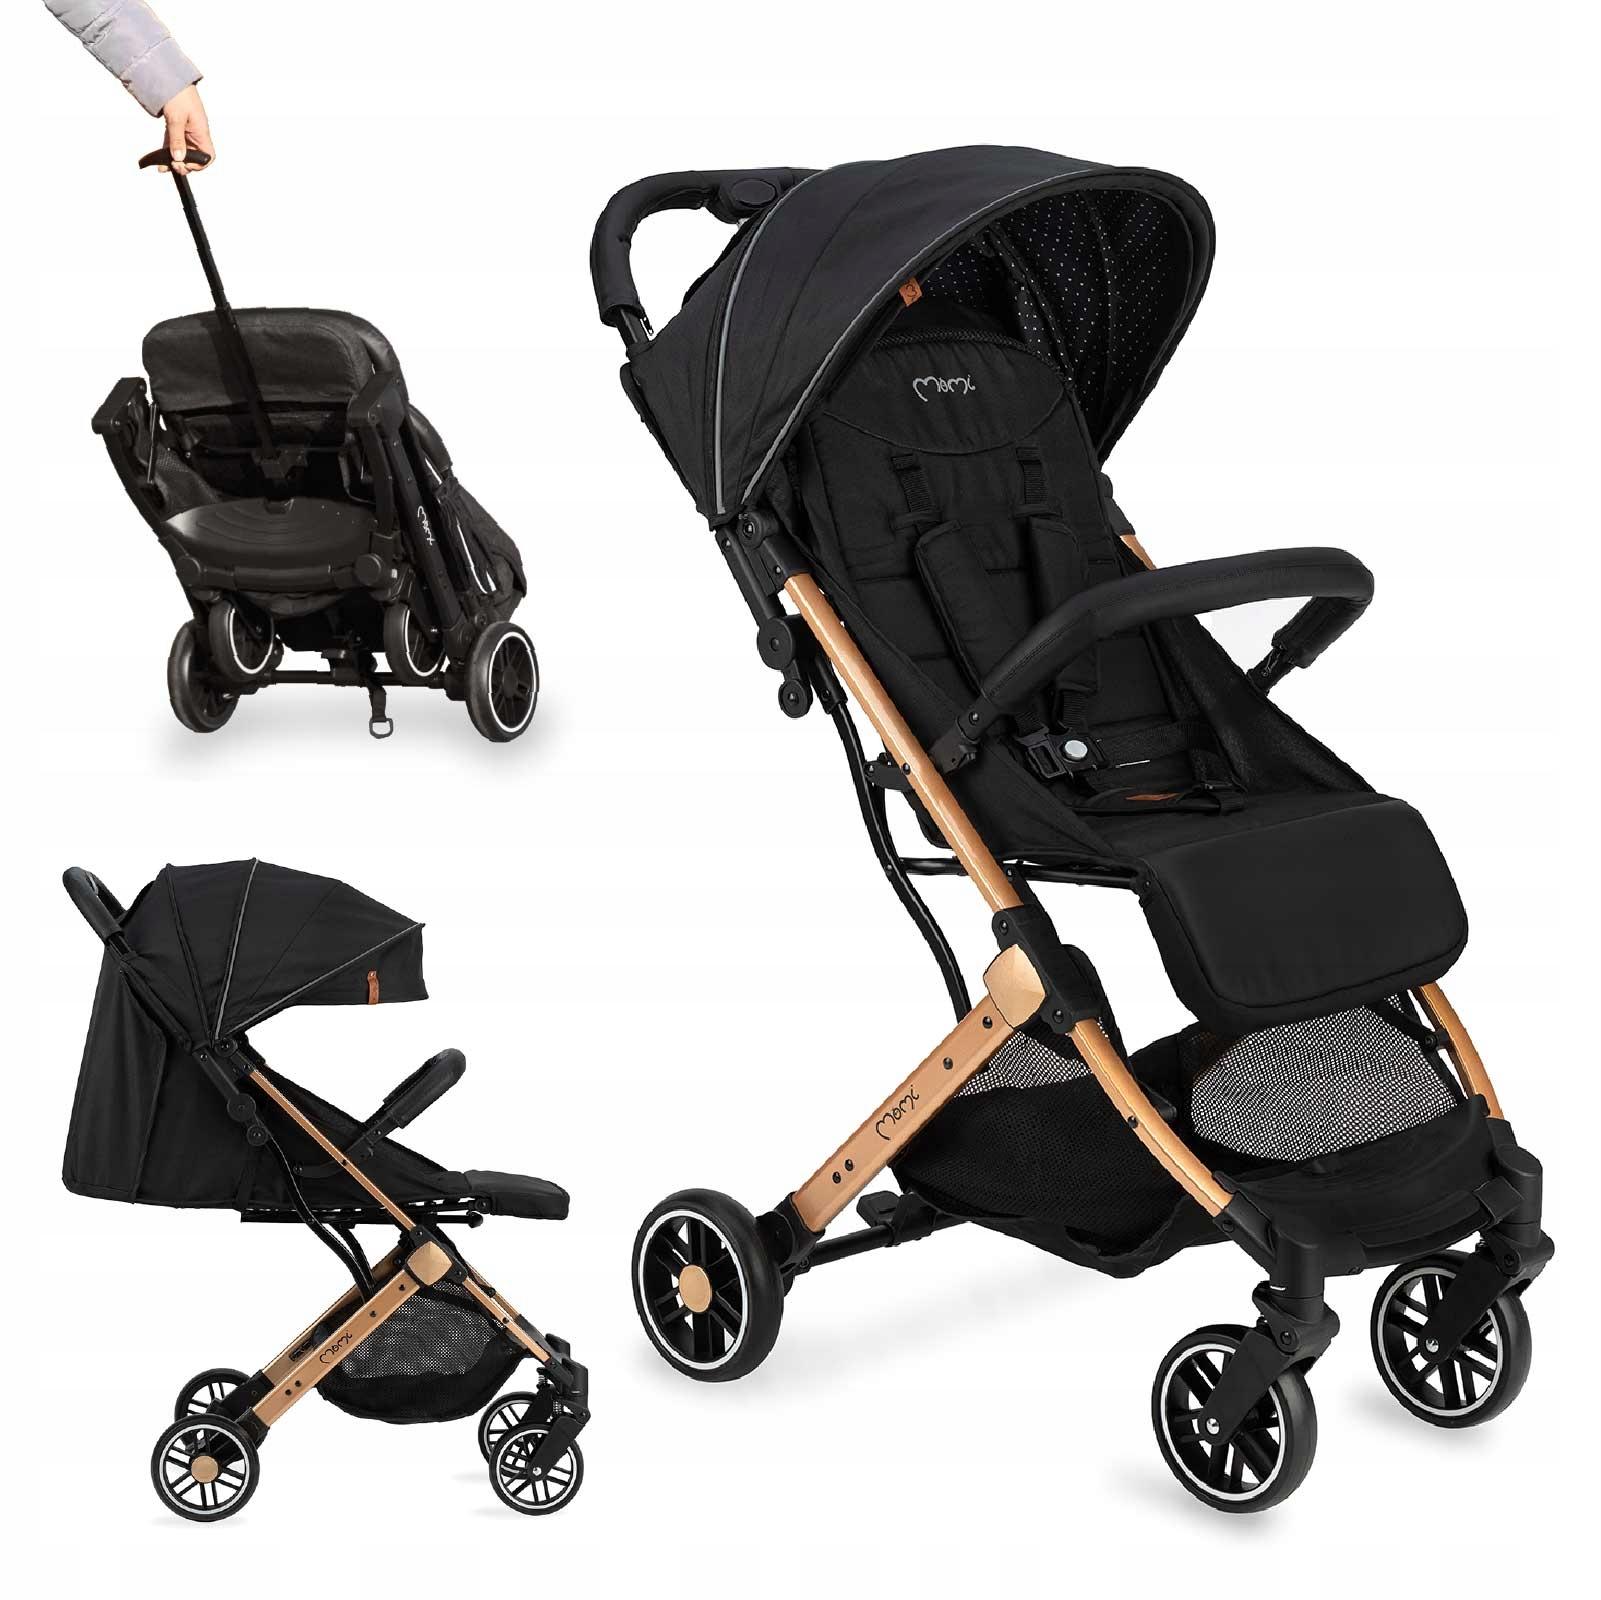 MoMi ESTELLE wózek spacerowy czarny